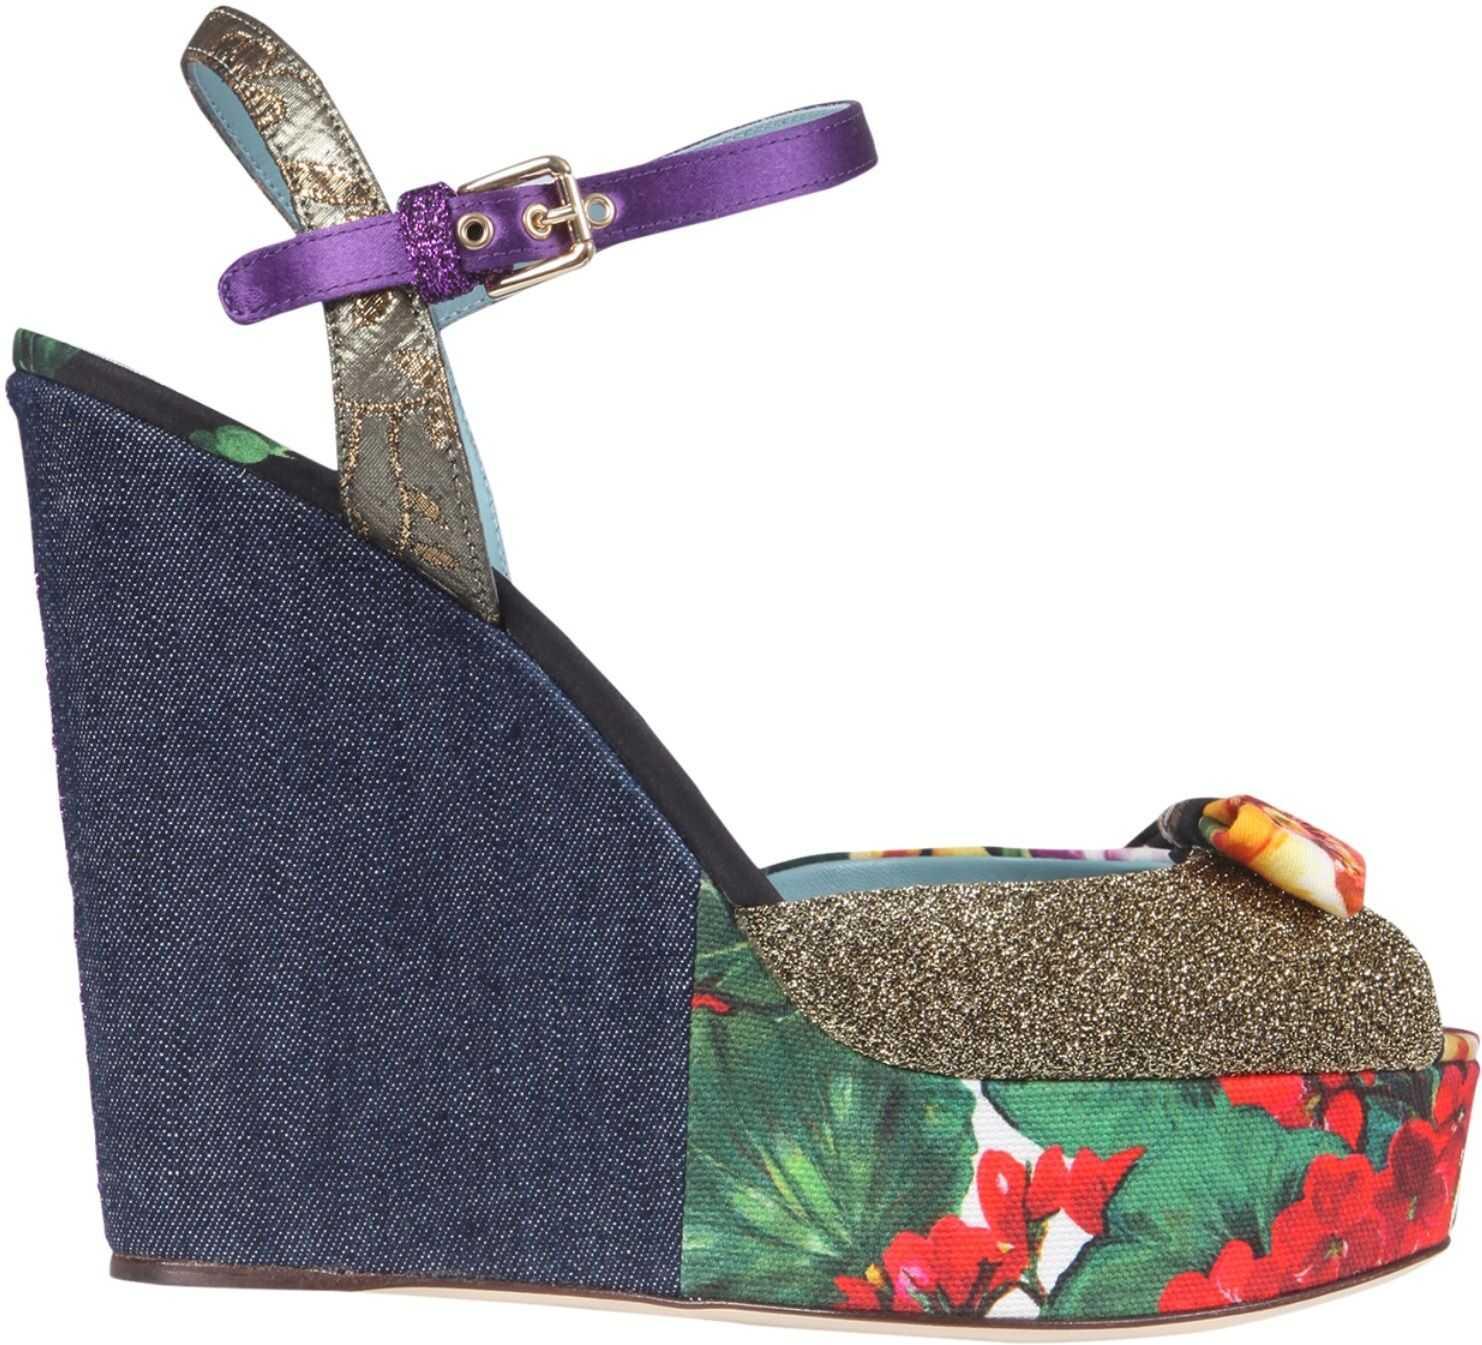 Dolce & Gabbana Wedge Sandals CZ0259_AO66180995 MULTICOLOUR imagine b-mall.ro